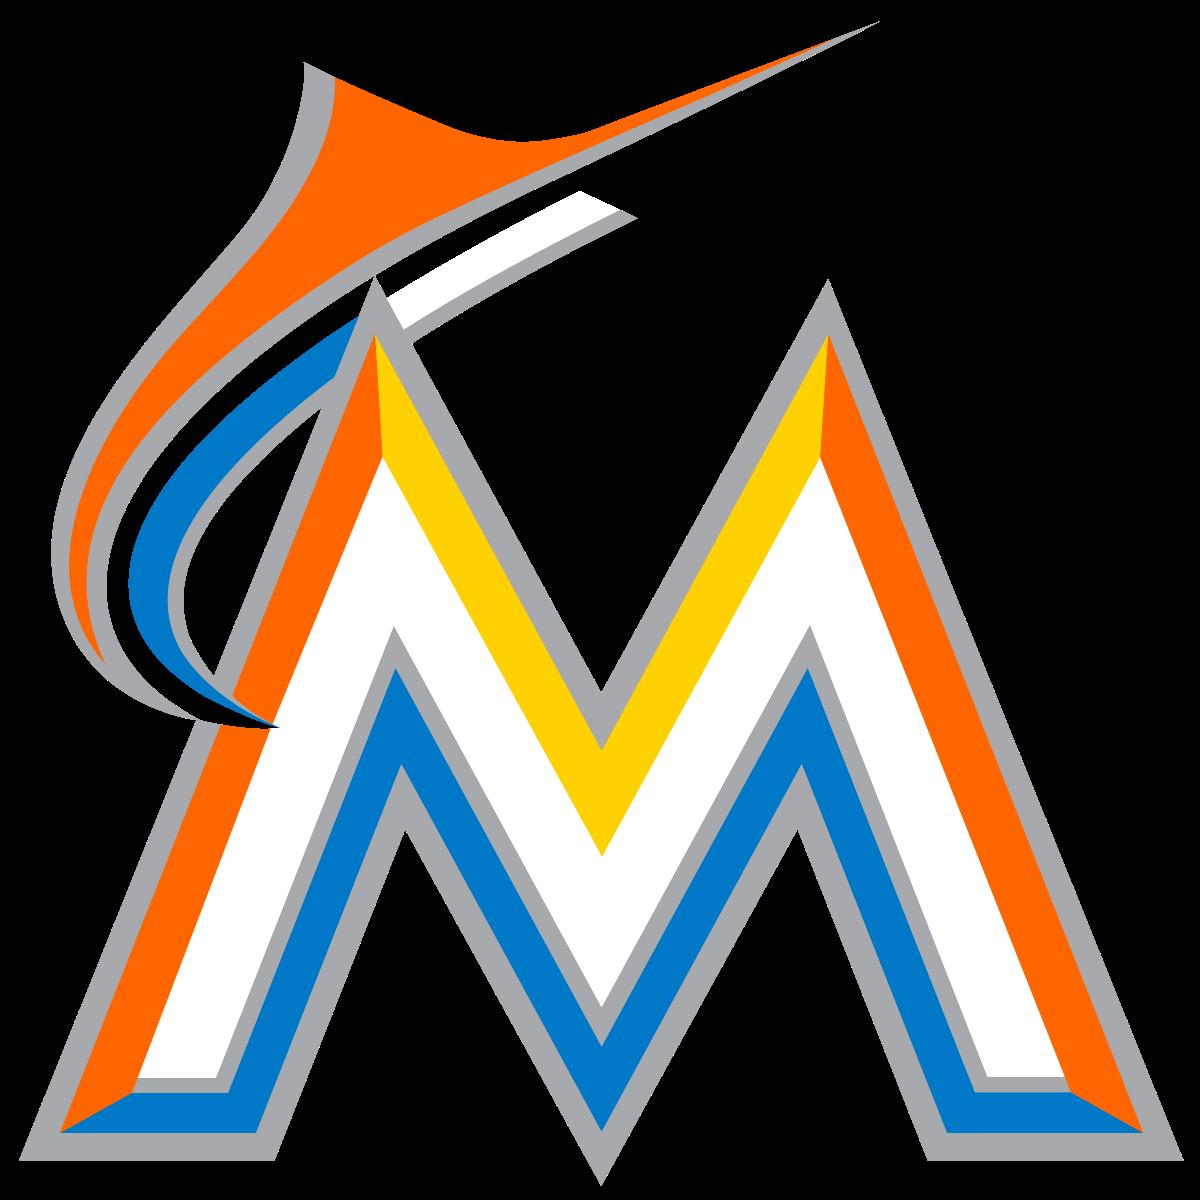 Baseball ticket clipart printable royalty free download Miami Marlins - Wikipedia royalty free download